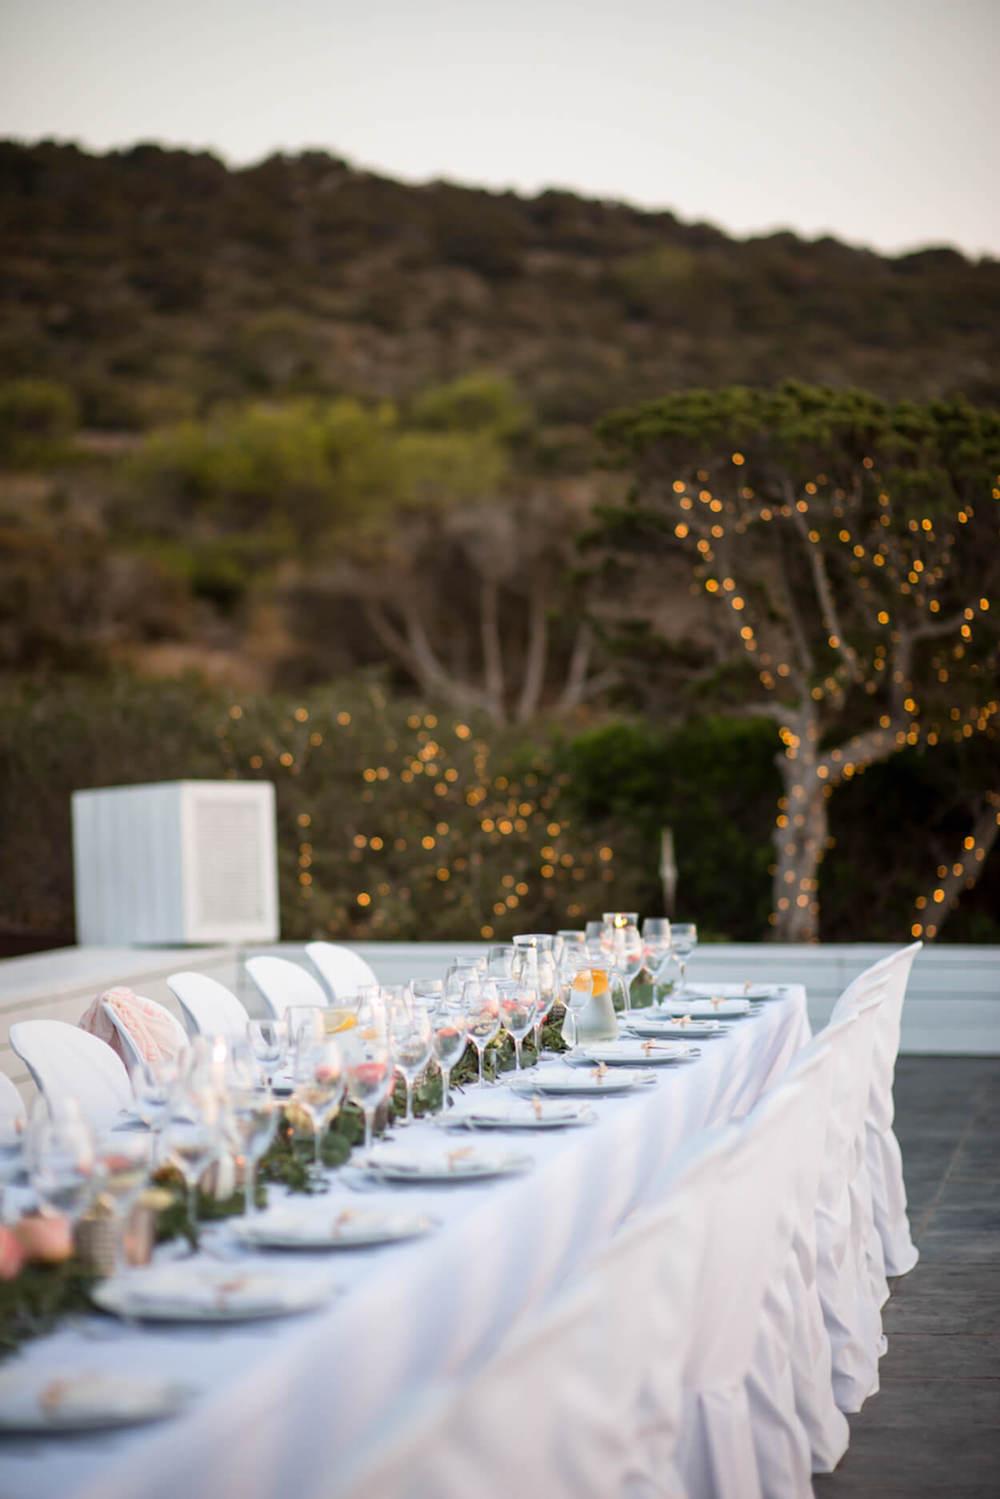 wedding dinner poolside night glow black tie fairy lights